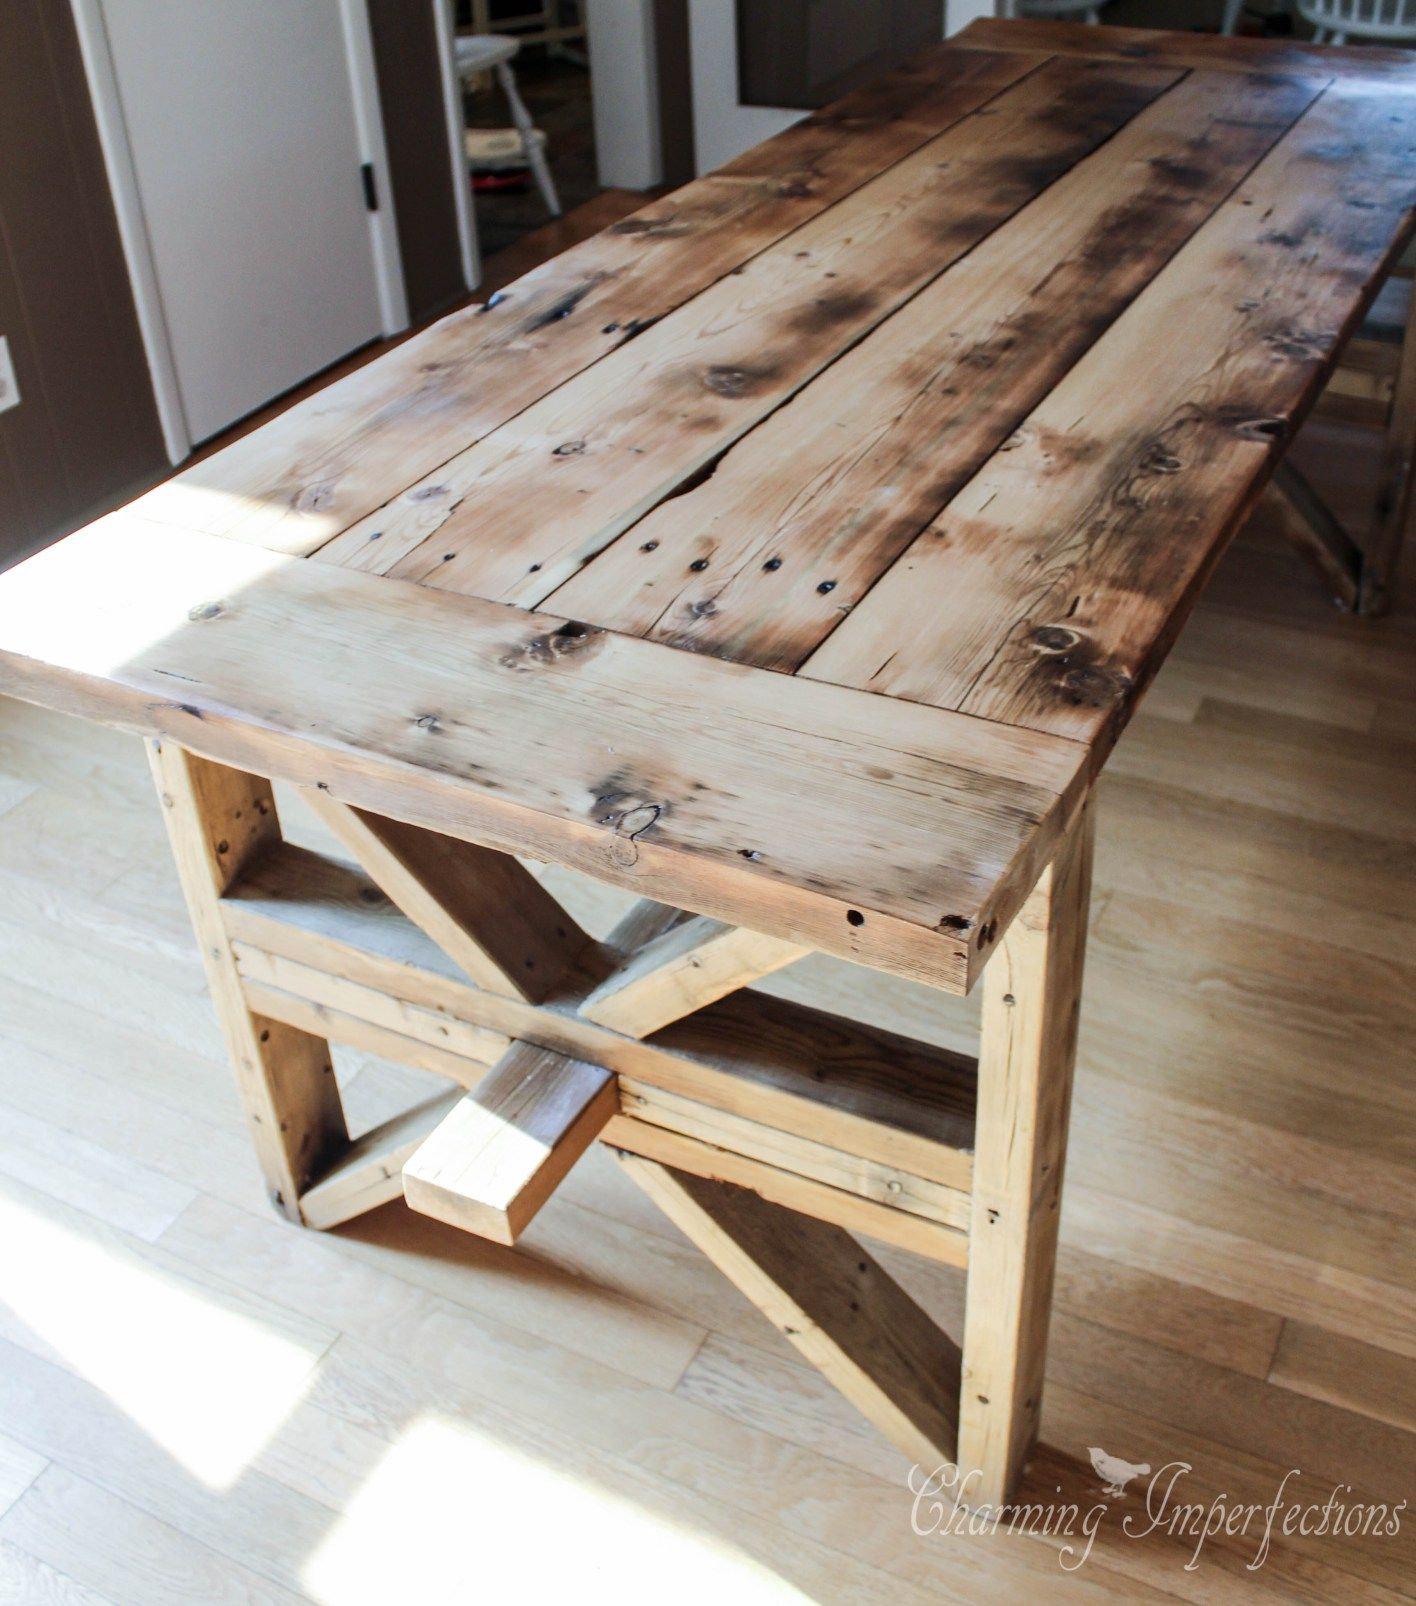 Diy farmhouse table with 2 style options for legs diy